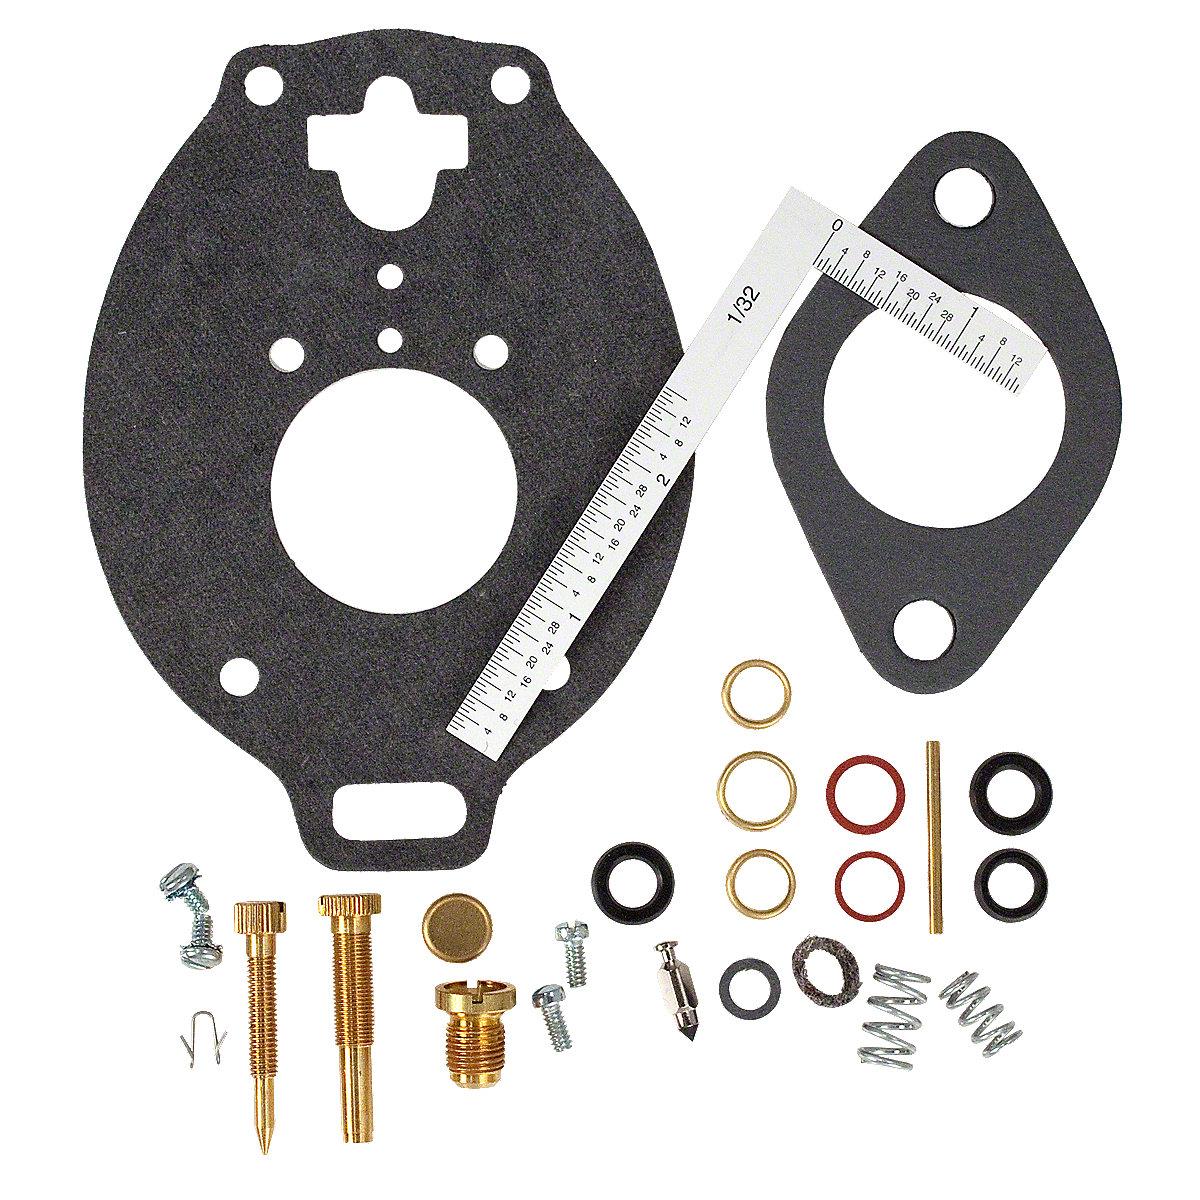 Marvel Schebler Carburetor kit For Massey Ferguson: 303, 85, 88, Super 90, Massey Harris: 102, 201, 202, 203.